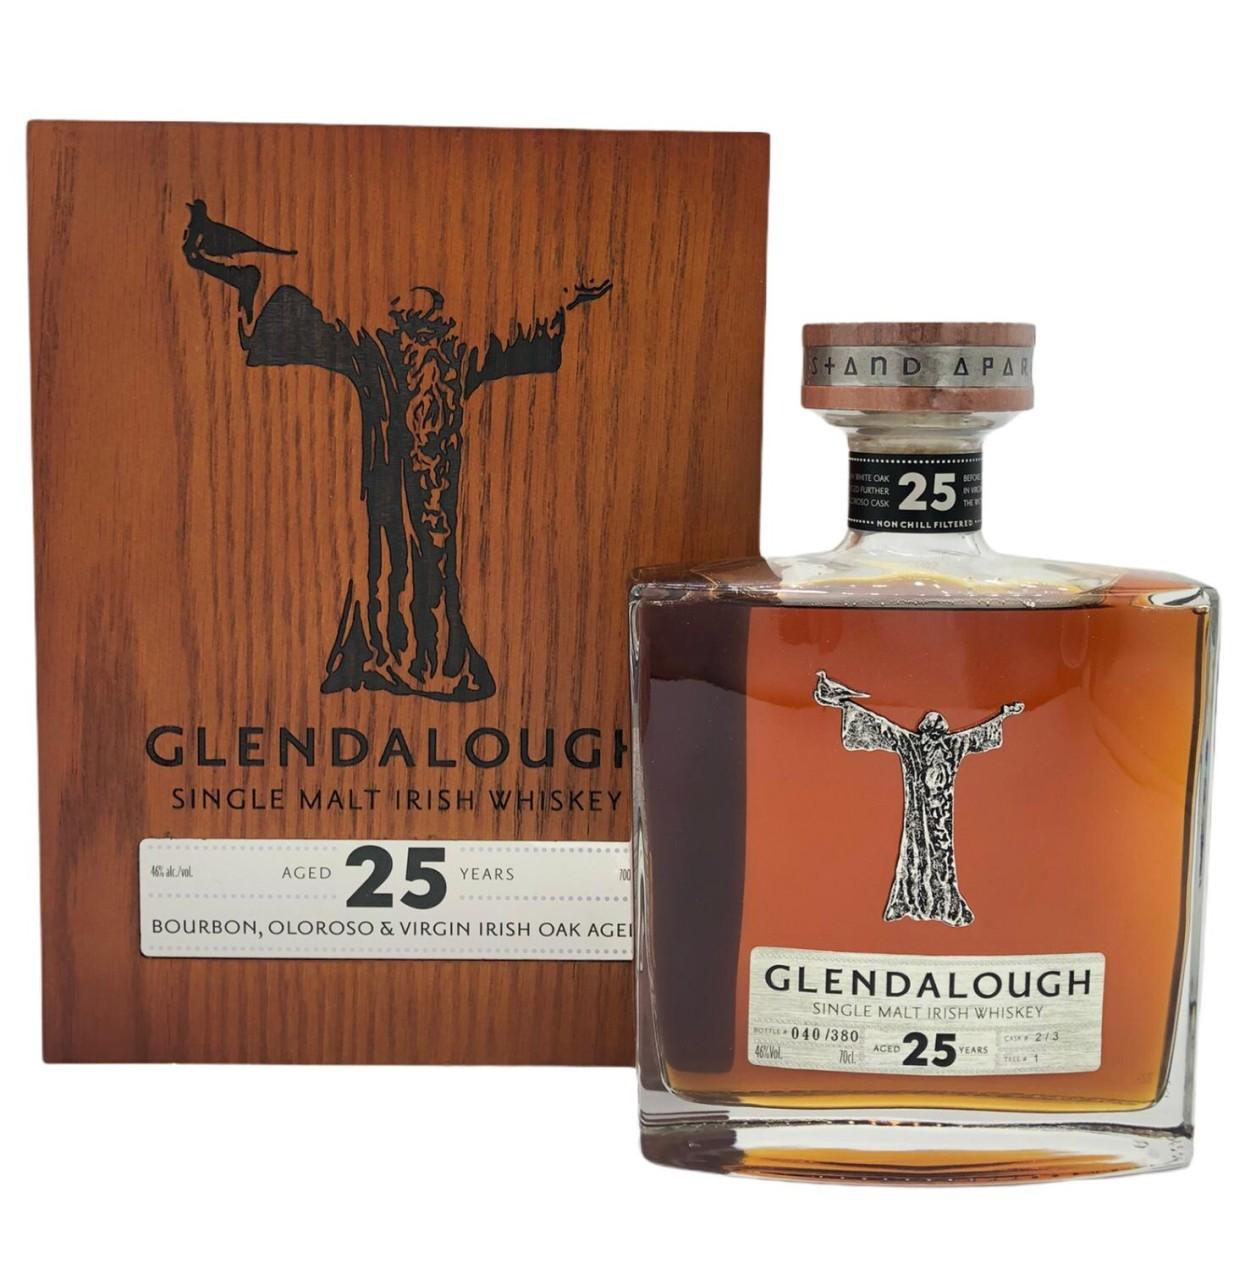 Glendalough Single malt irish Whiskey 25 Years old 0,7 l